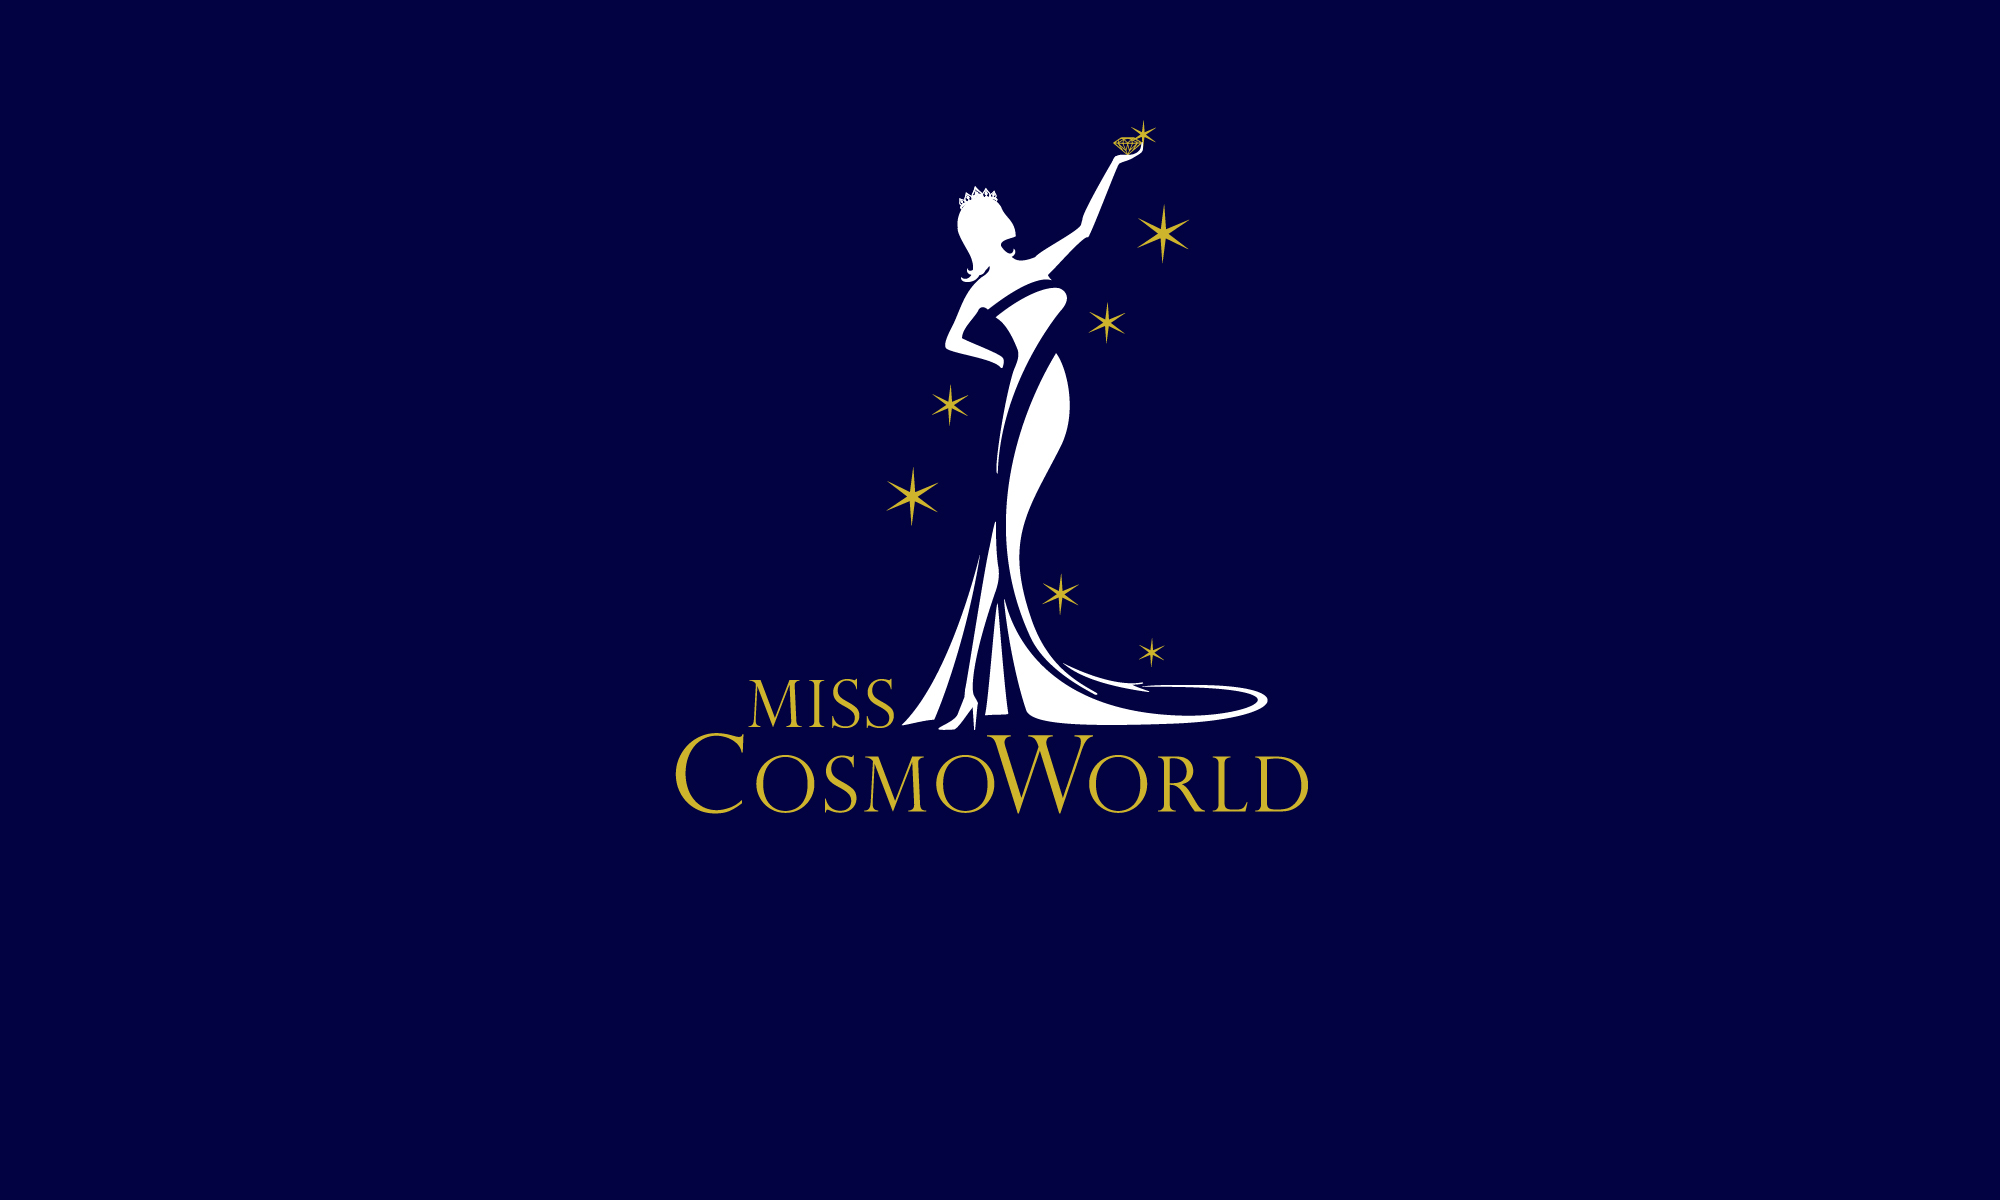 Miss CosmoWorld